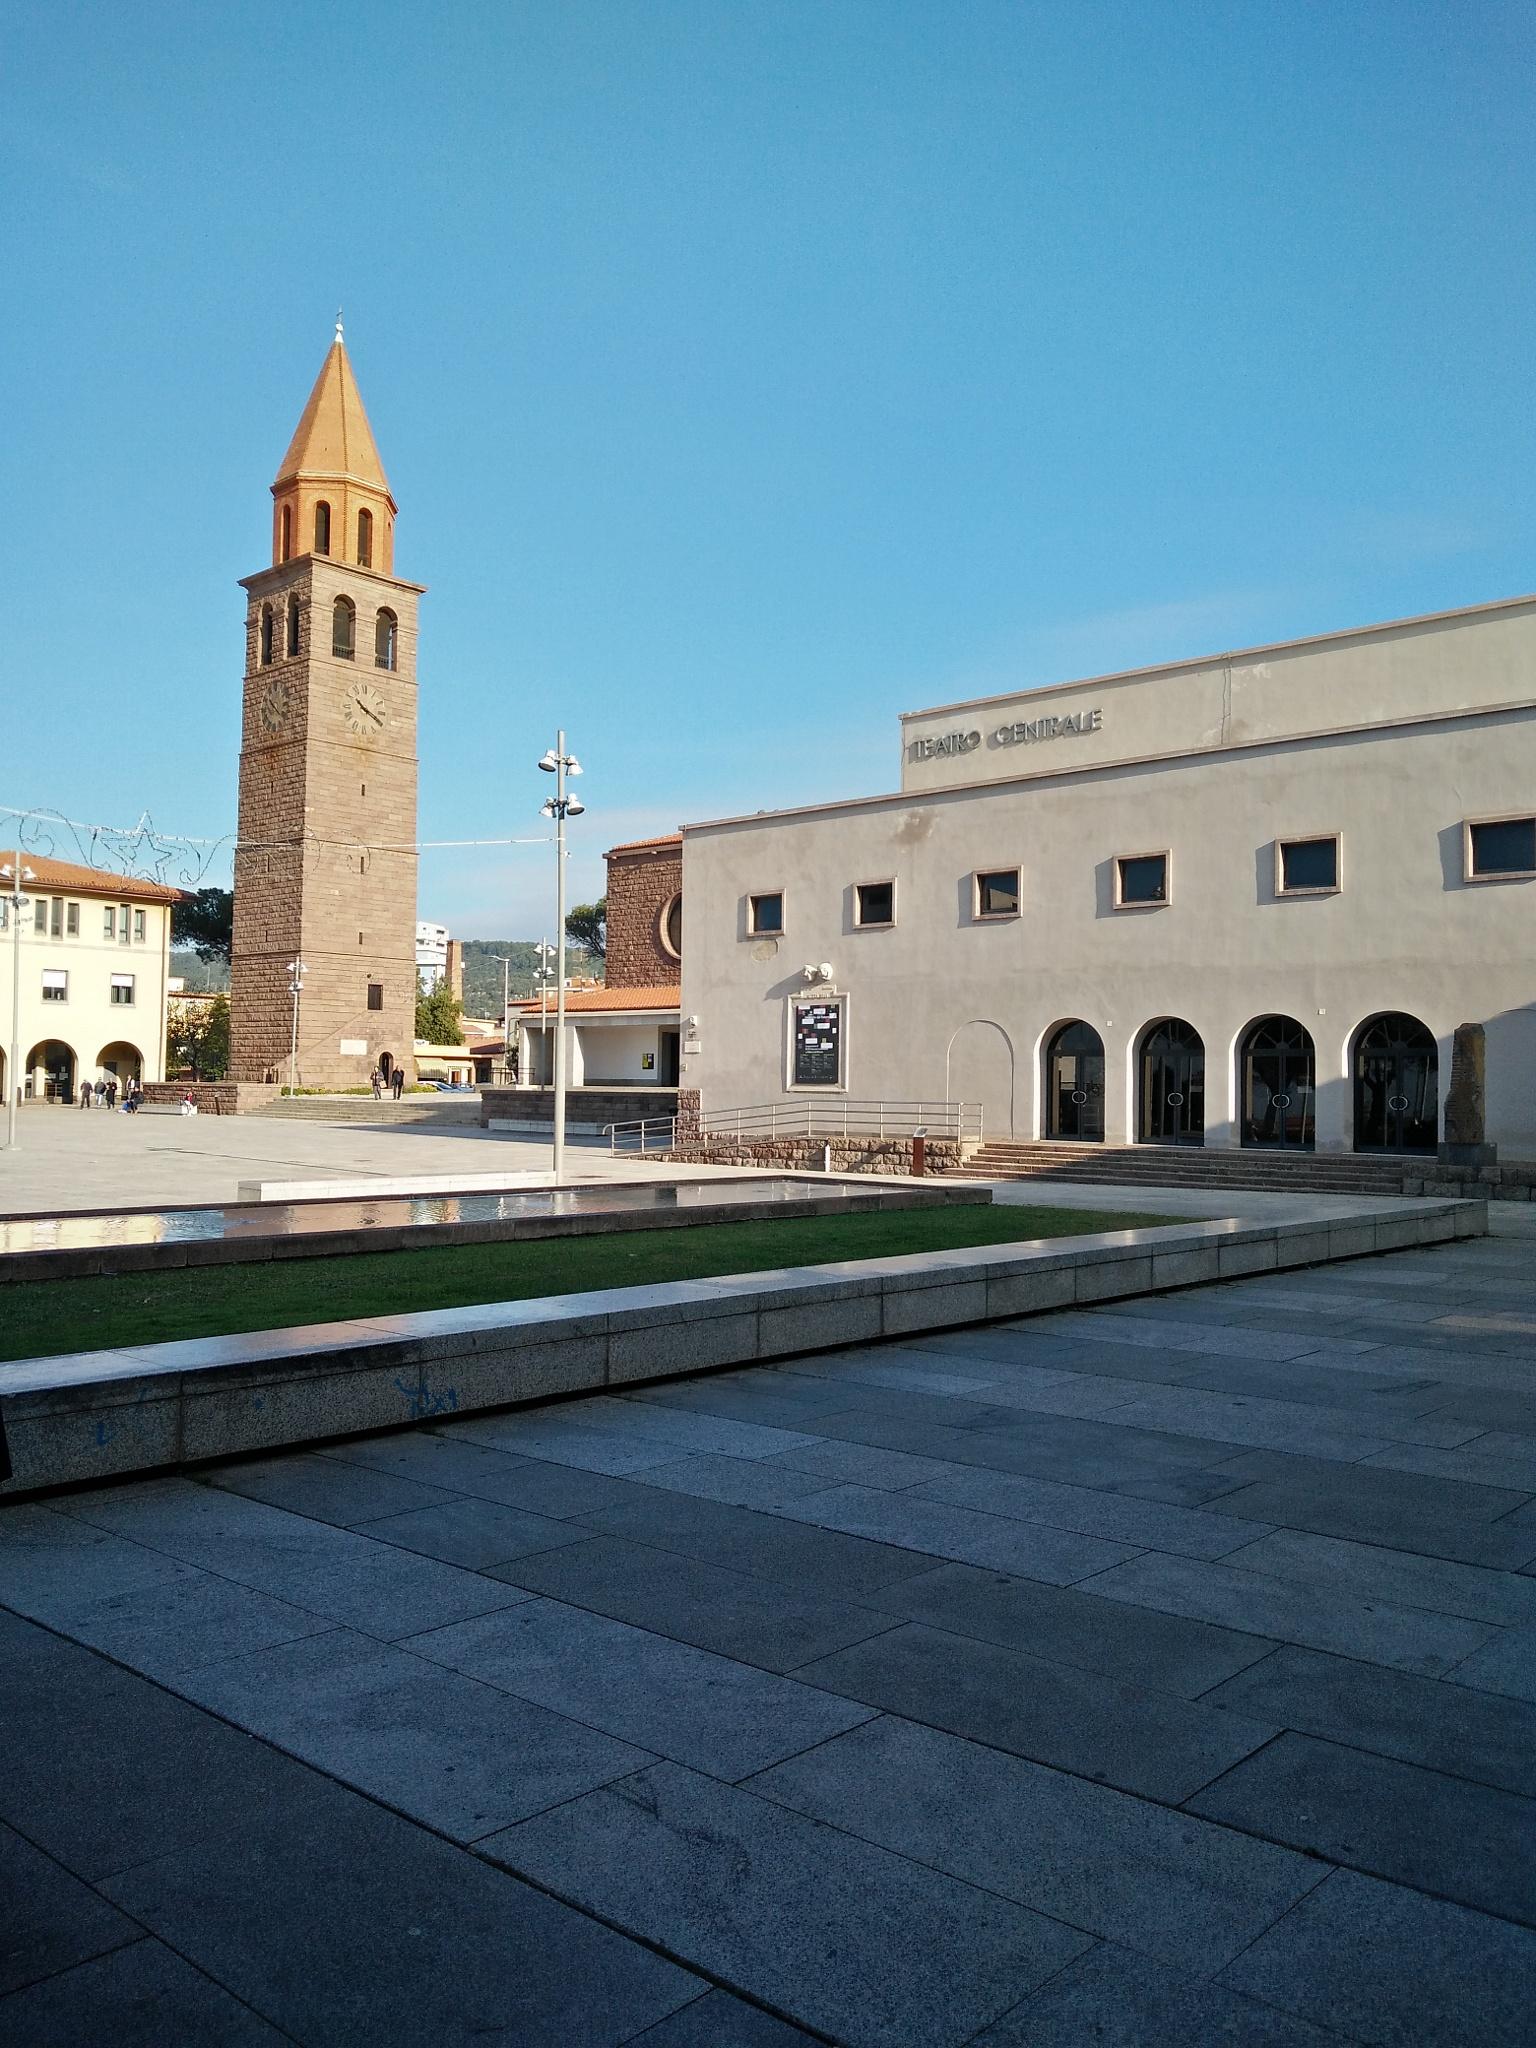 Theatre and Church by Fabio Pinna